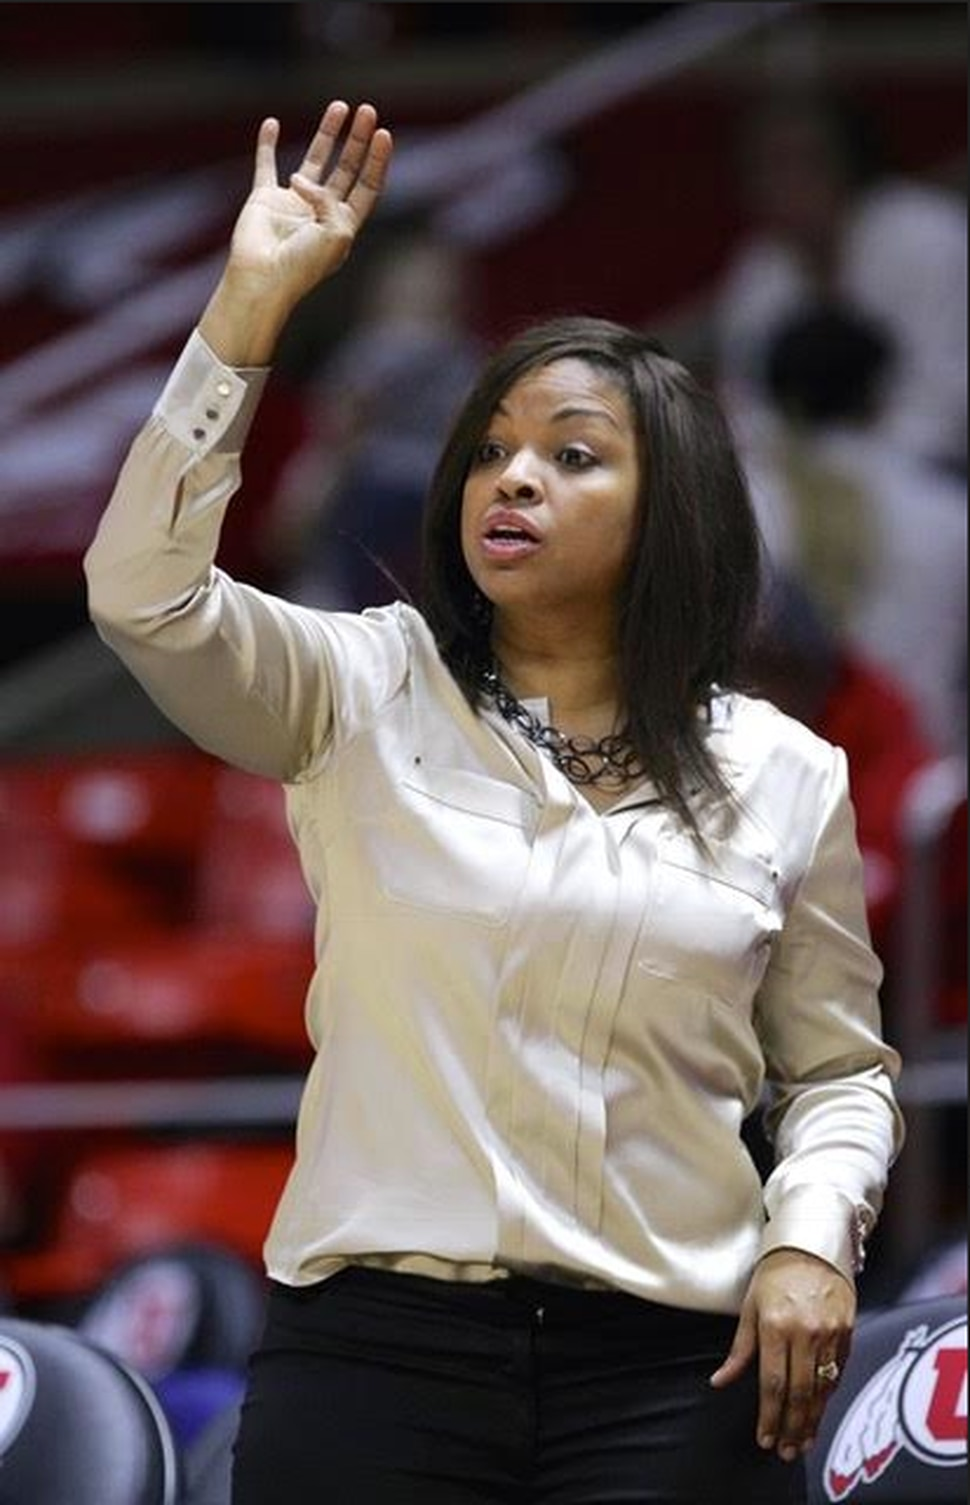 New Weber State women's basketball coach Velaida Harris.